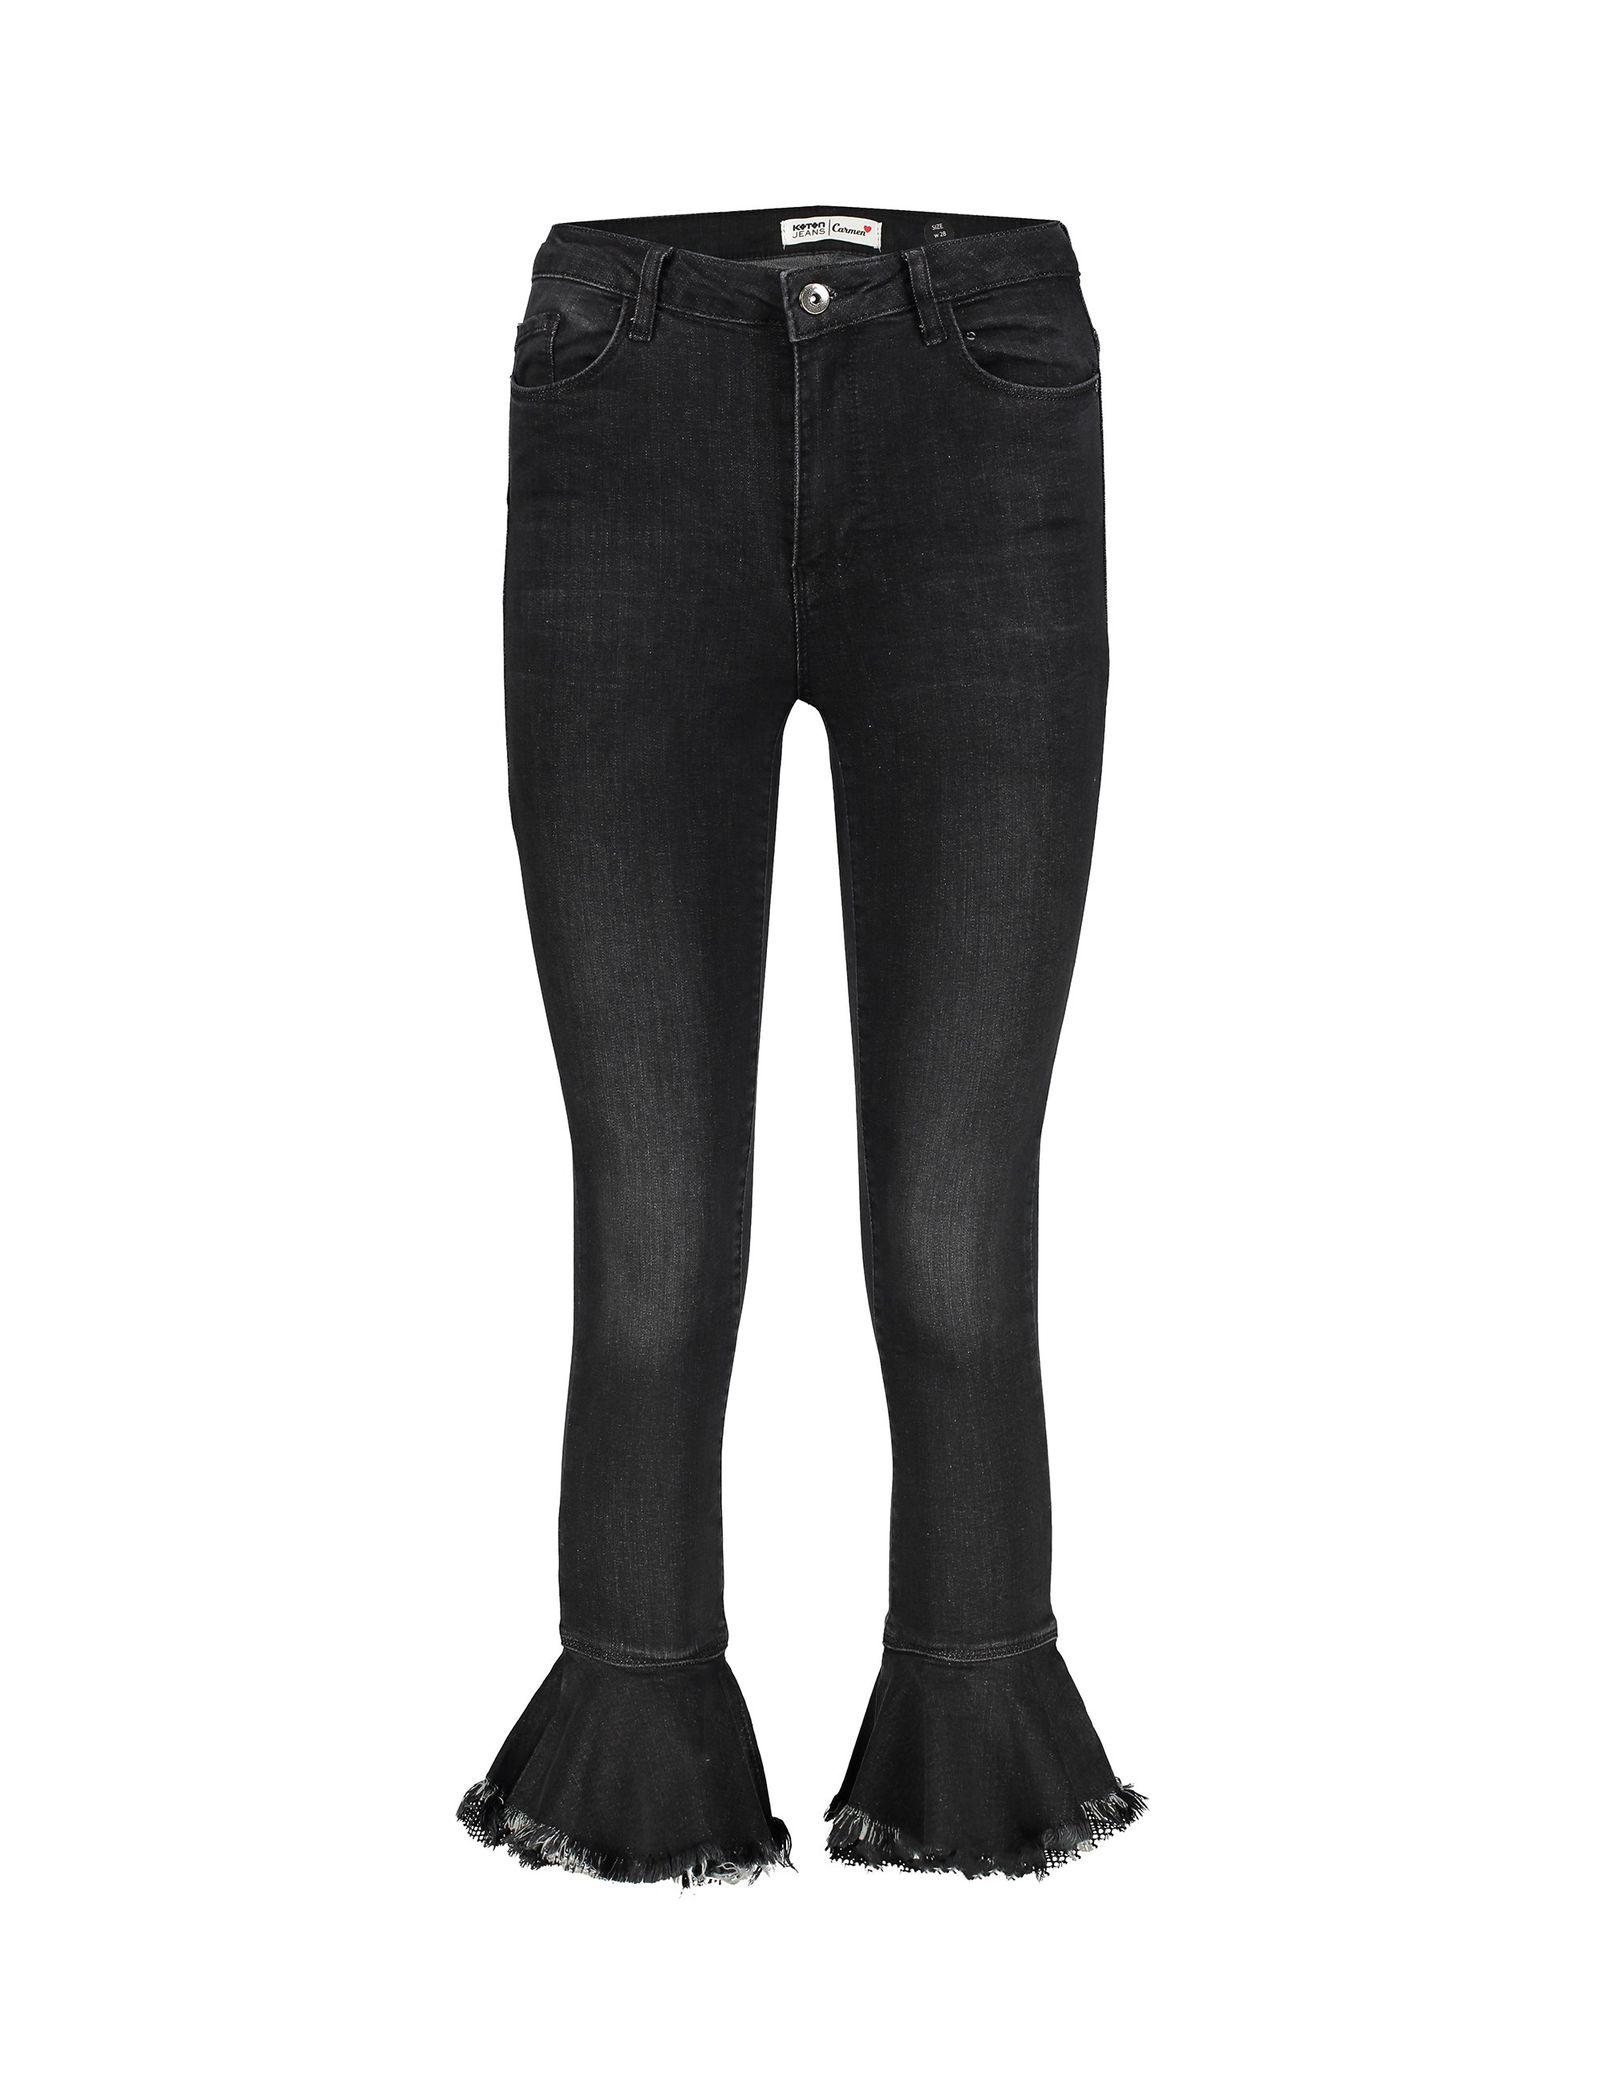 شلوار جین دم پا گشاد زنانه - کوتون - مشکي - 1